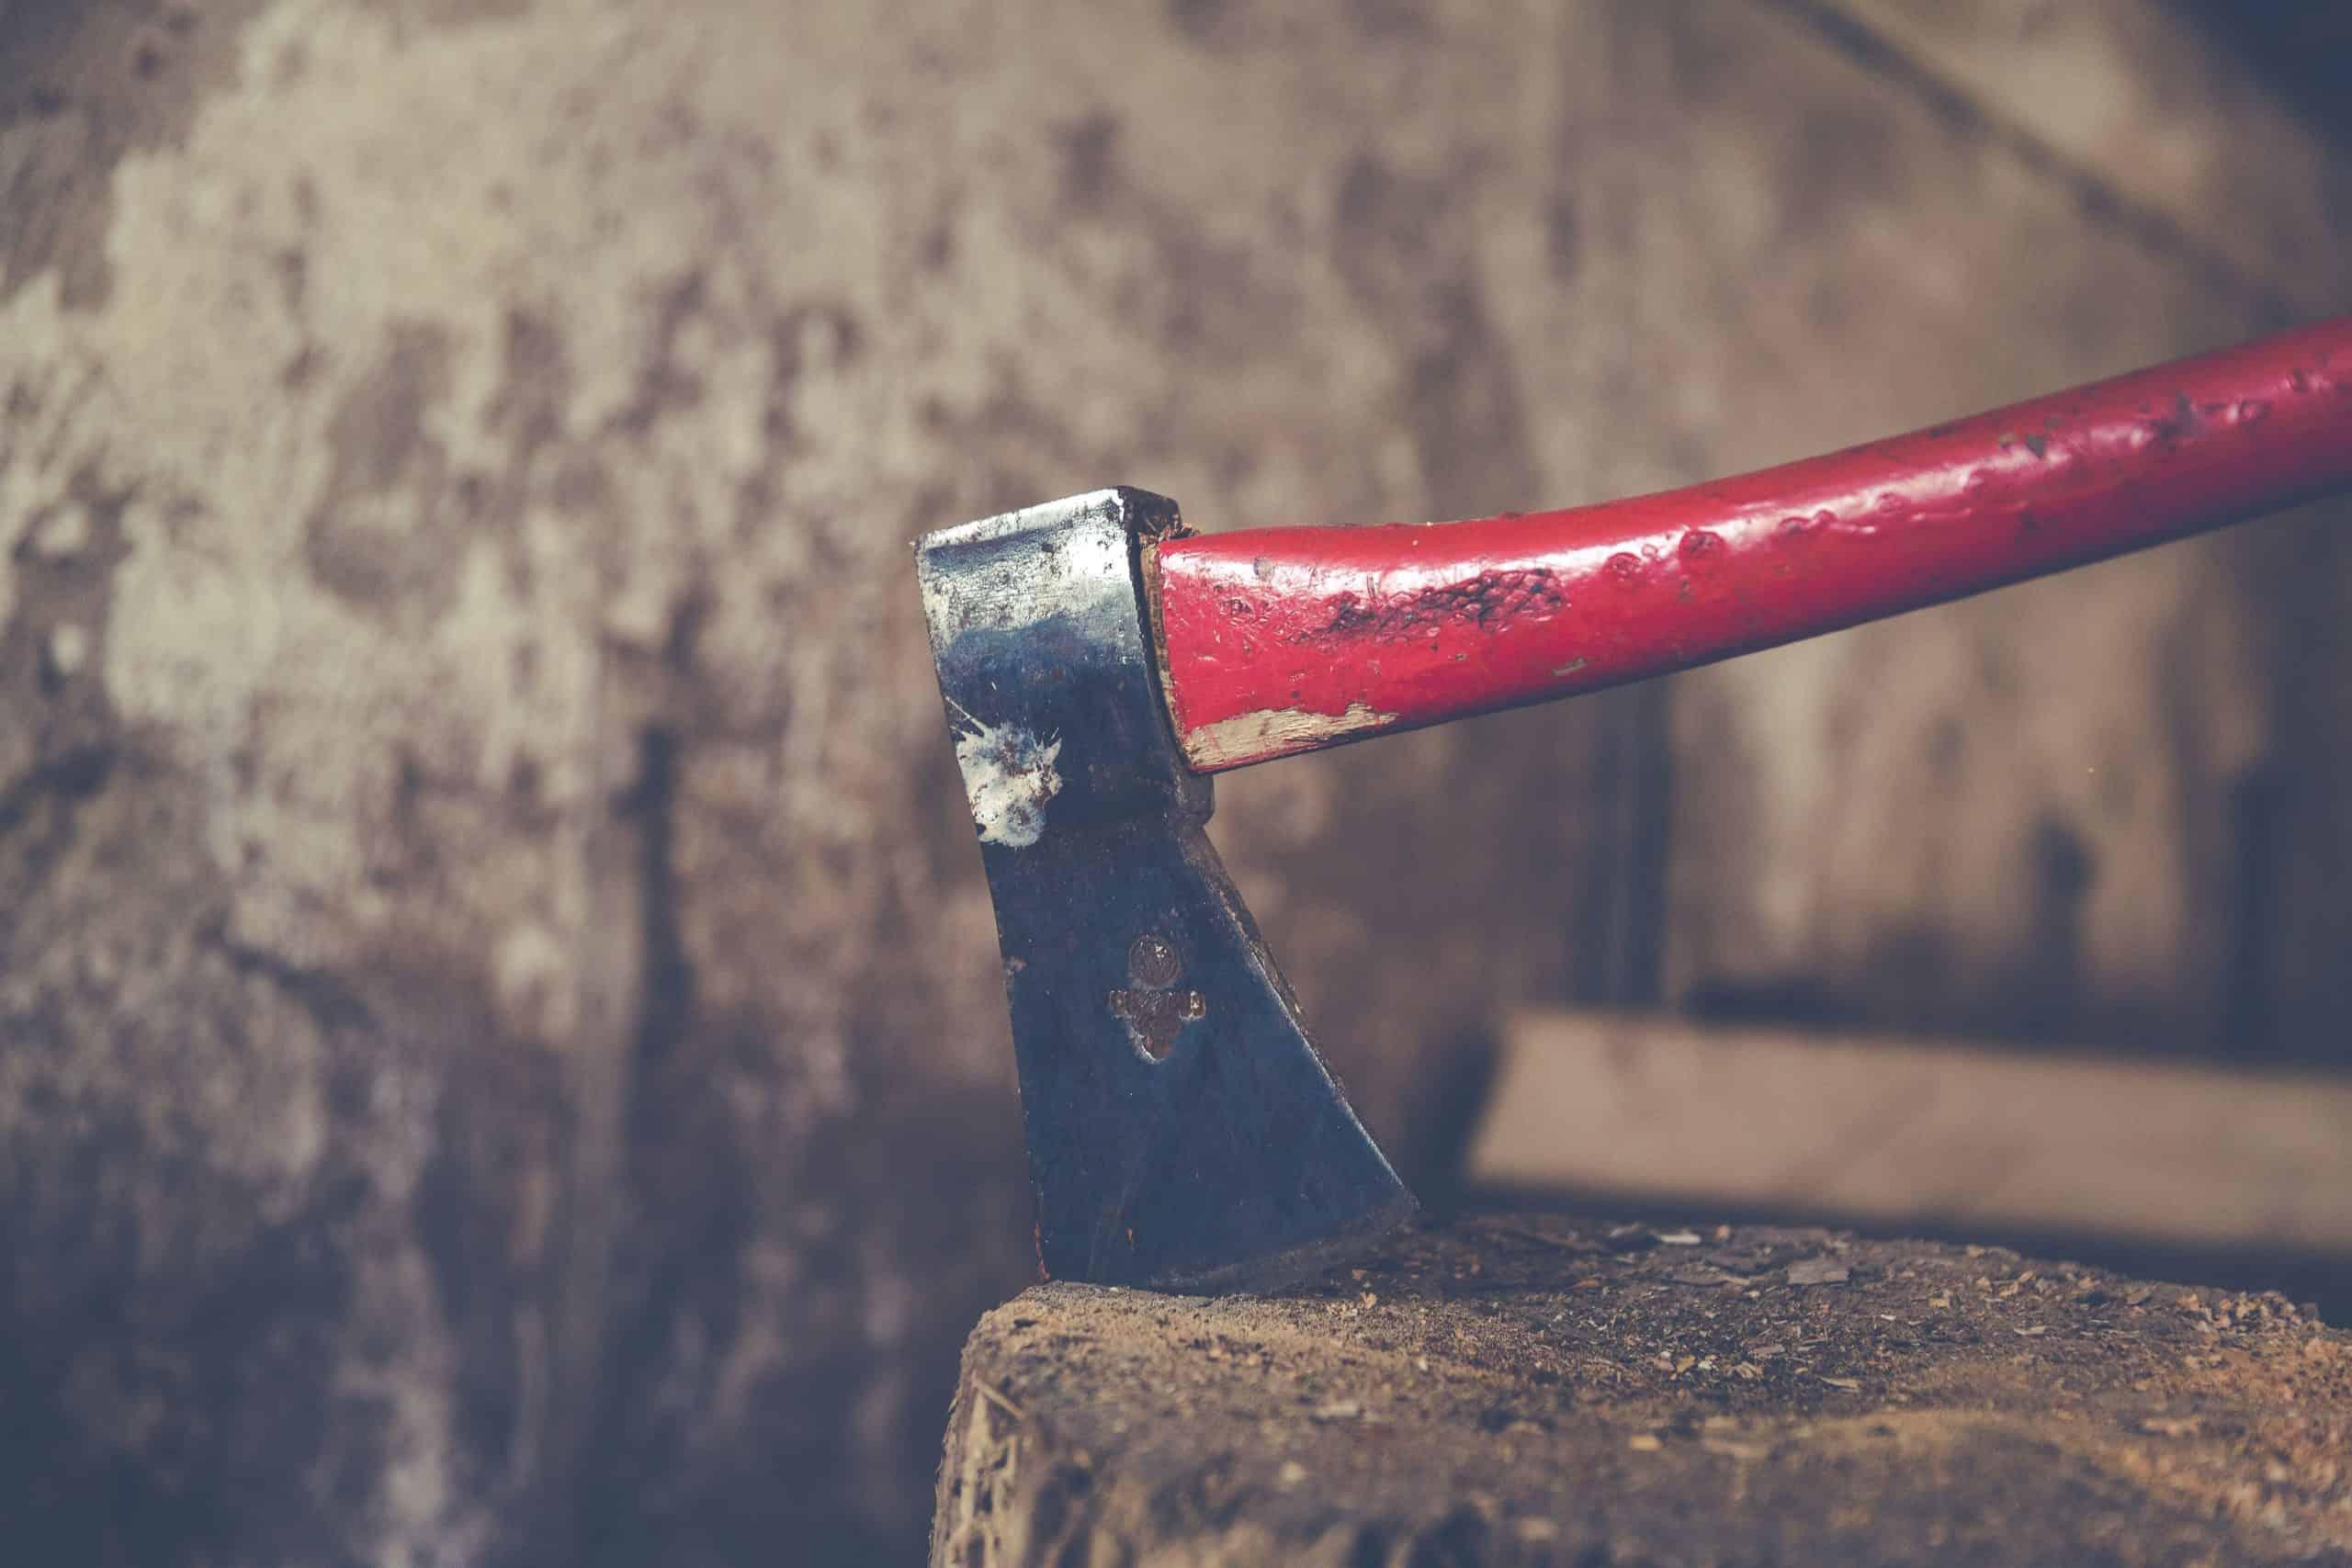 hatchet in a stump